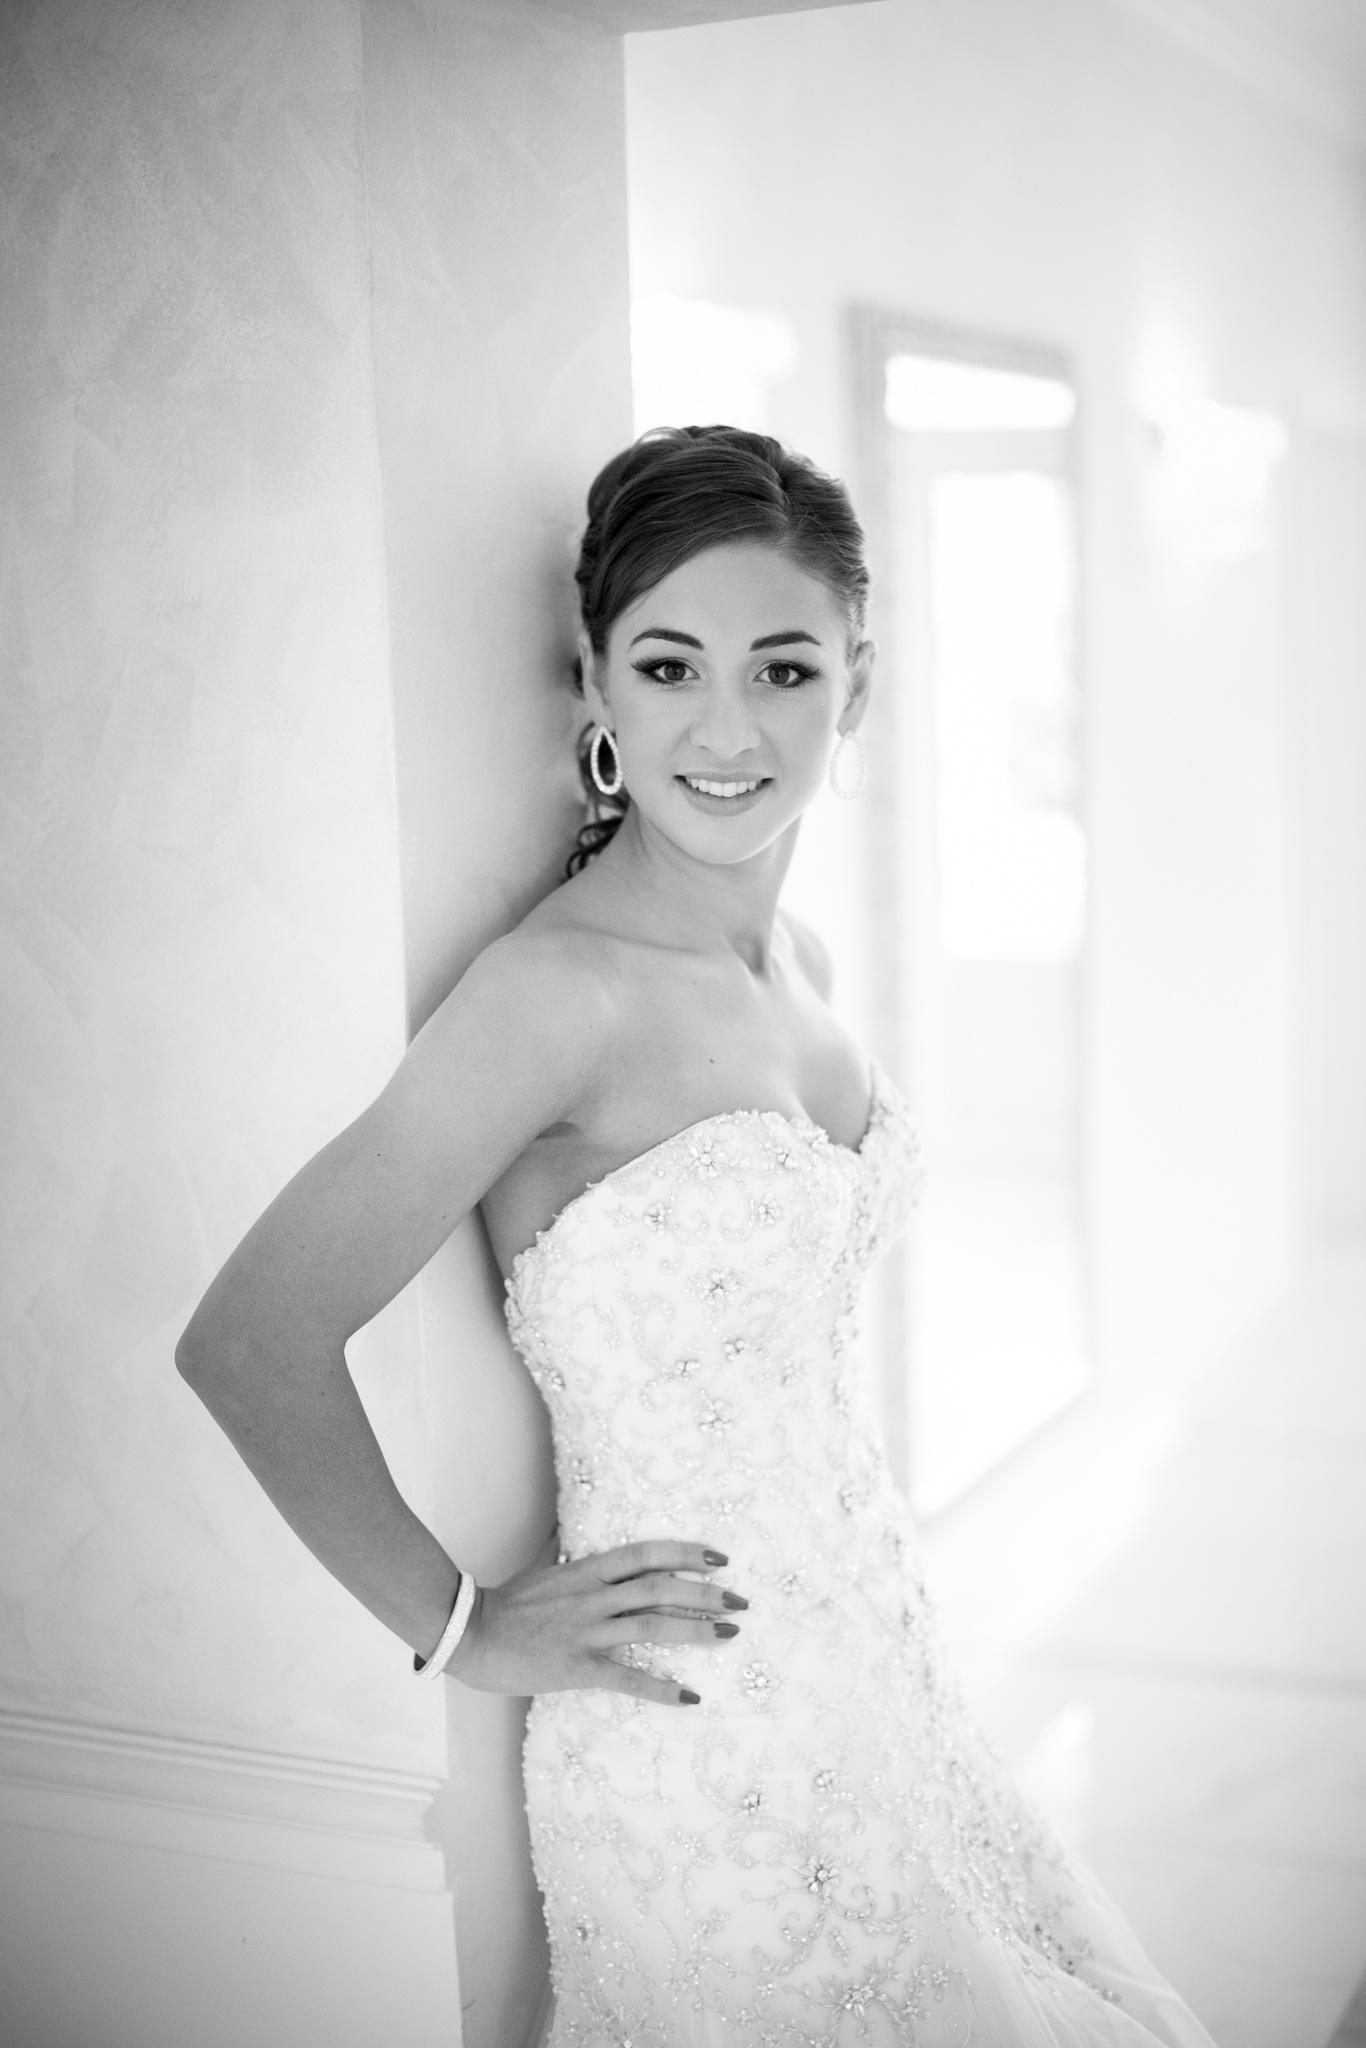 Bride by Nedeliak Daniel